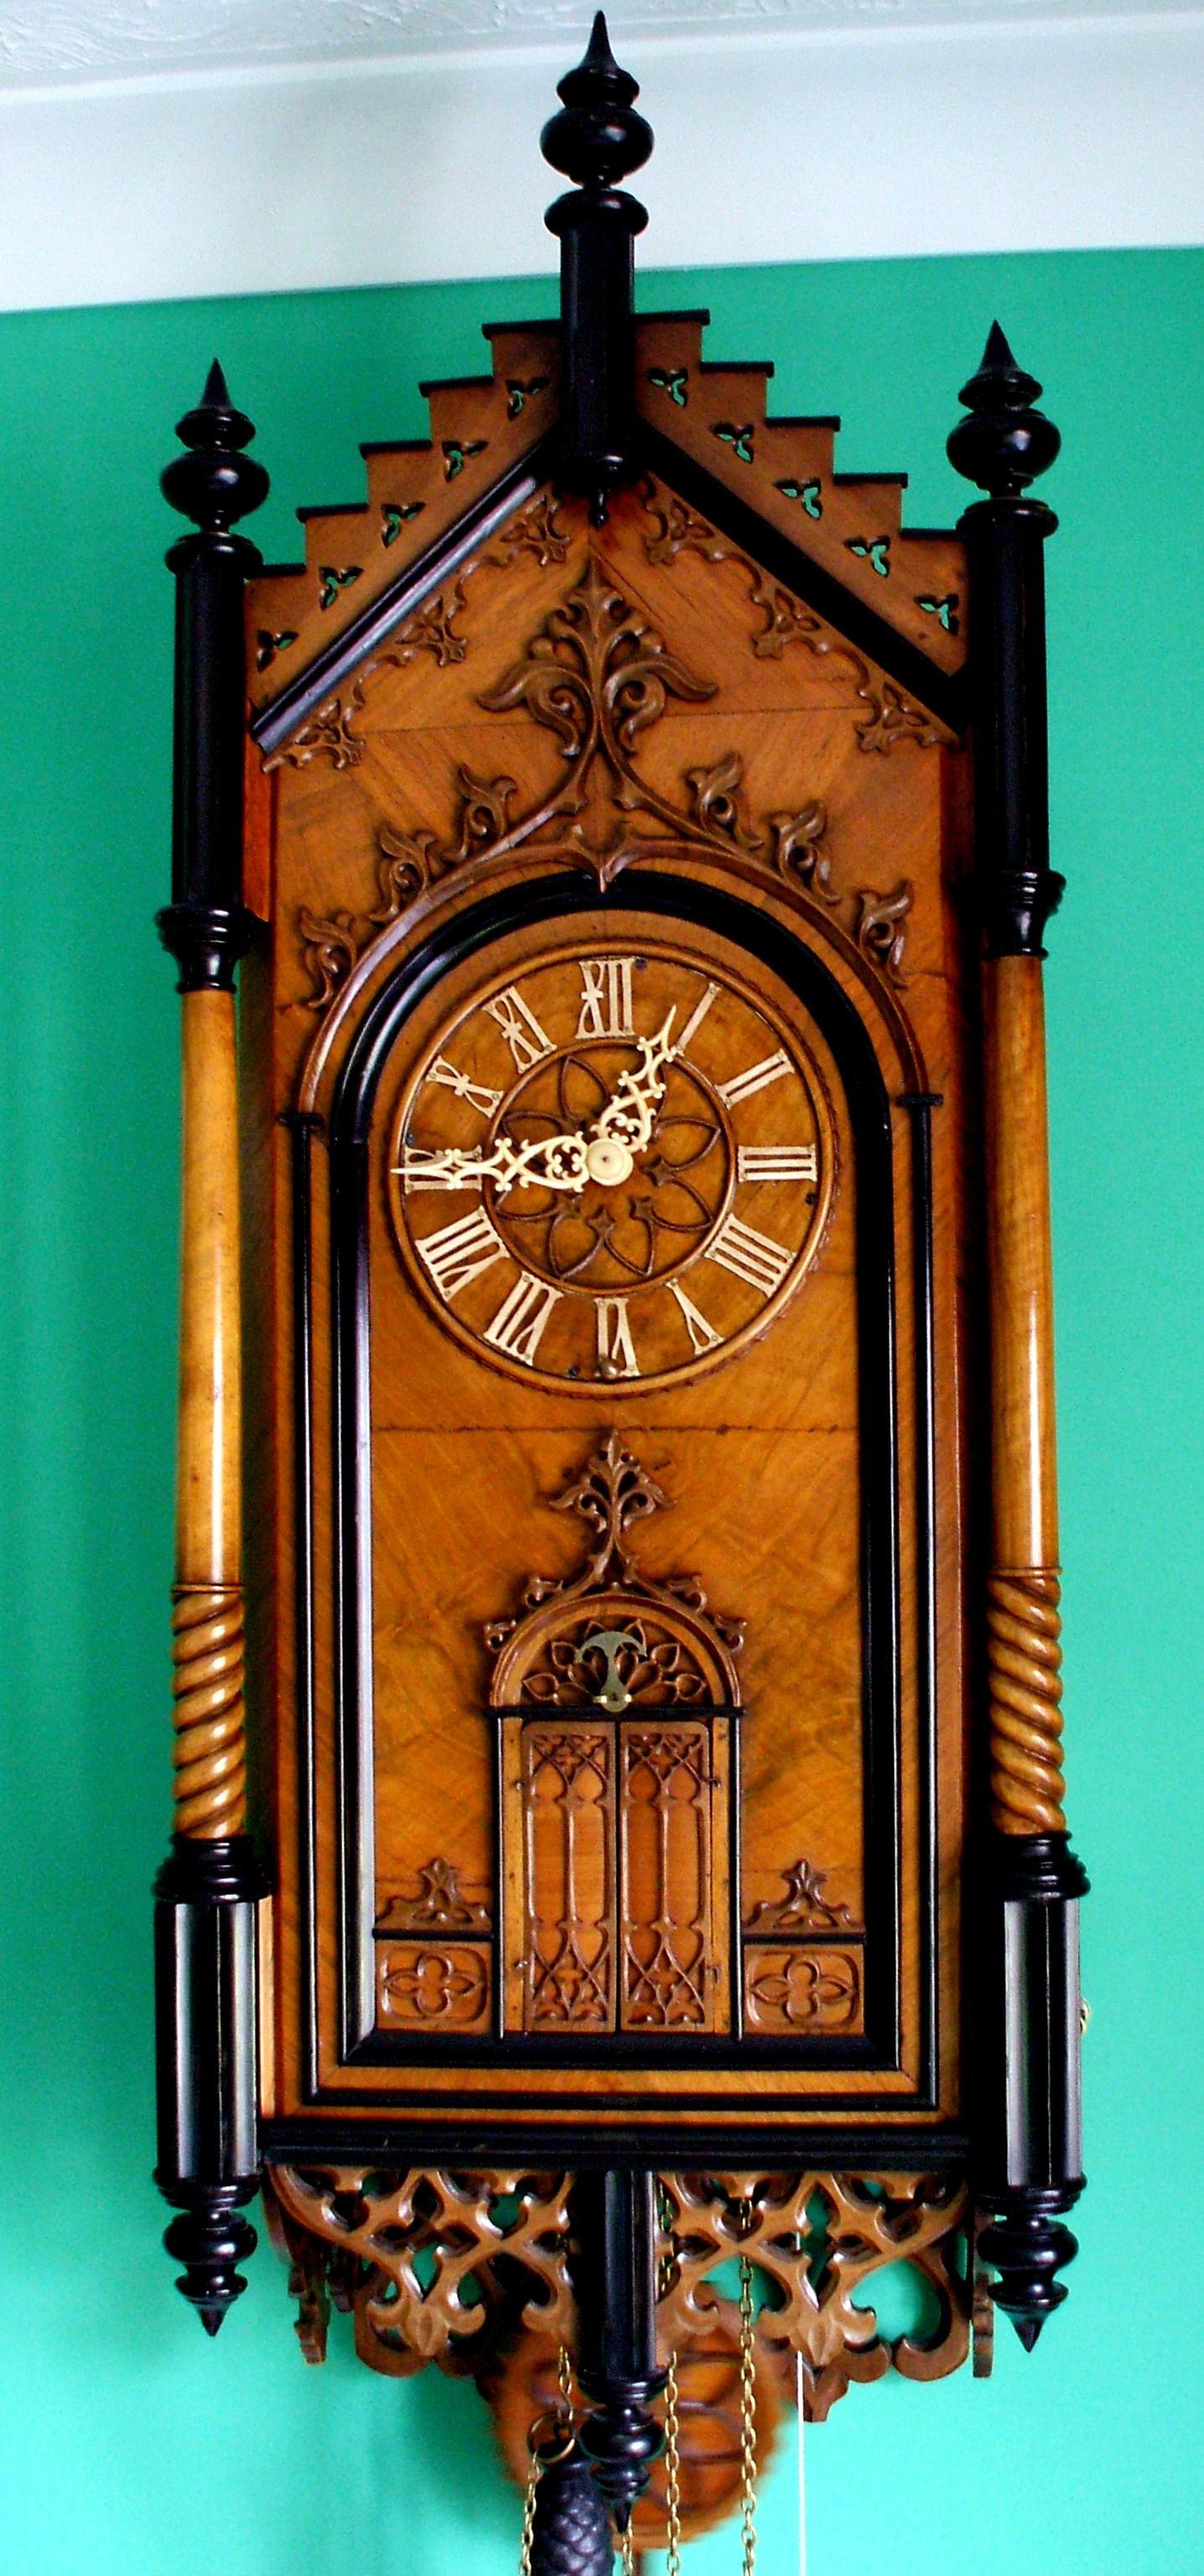 George's Wehrle Black Forest Clock